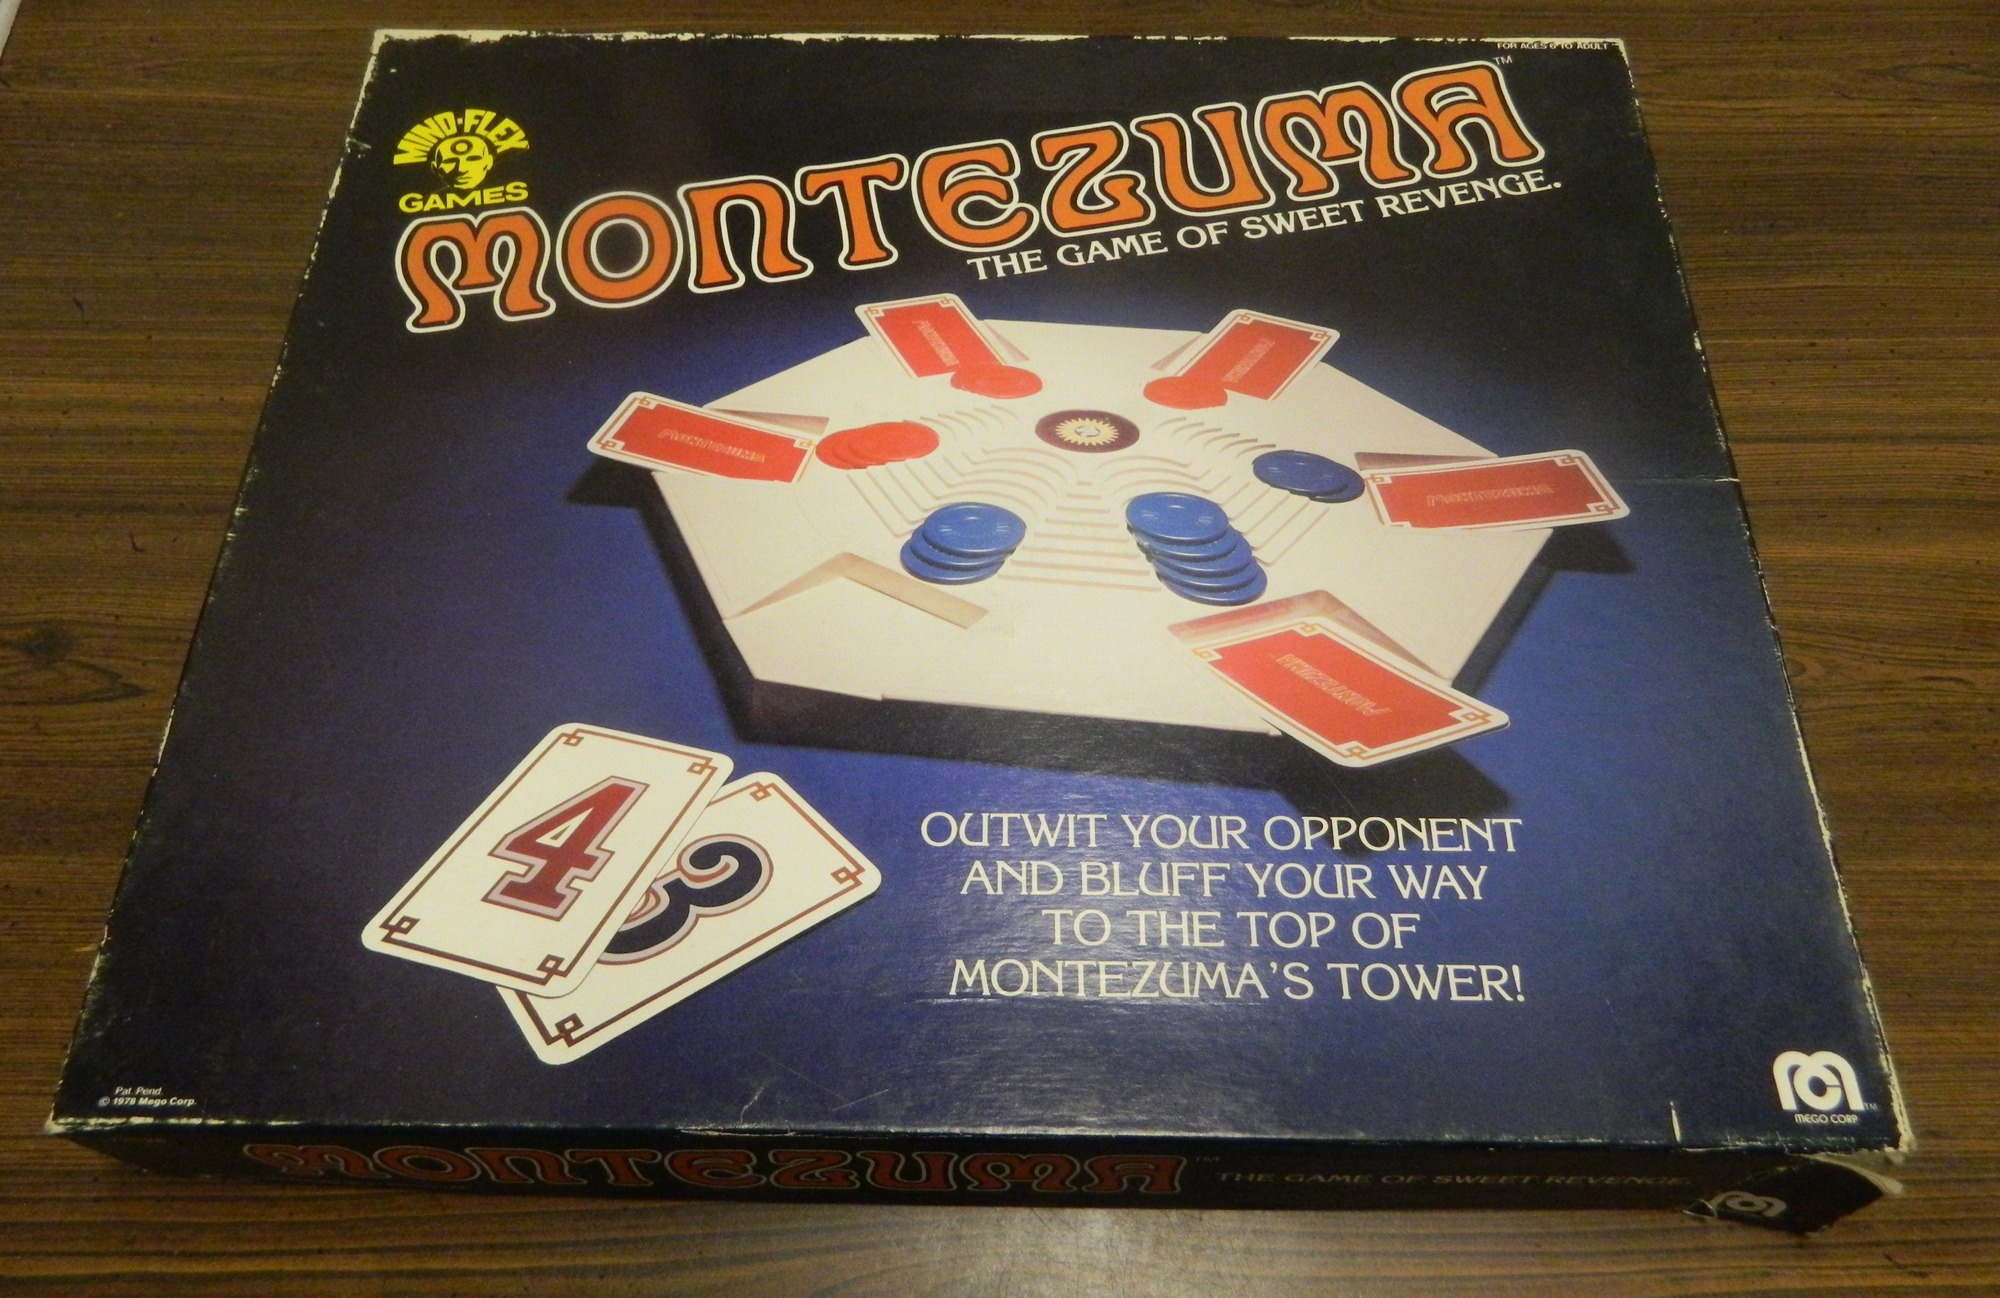 Box for Montezuma